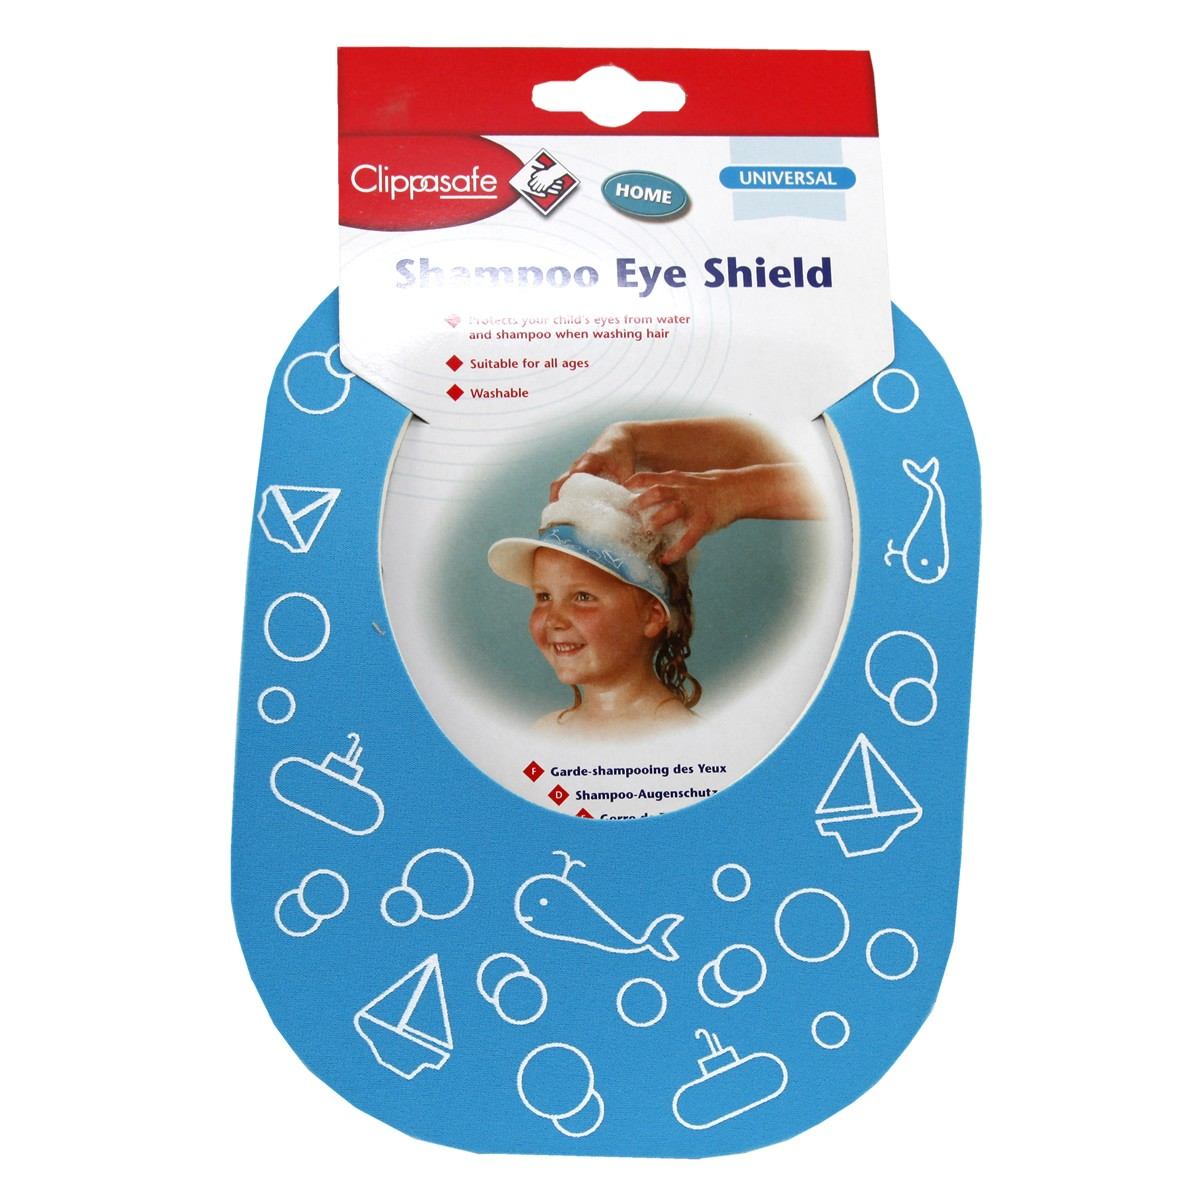 Clippasafe Universal Shampoo Eye Shield